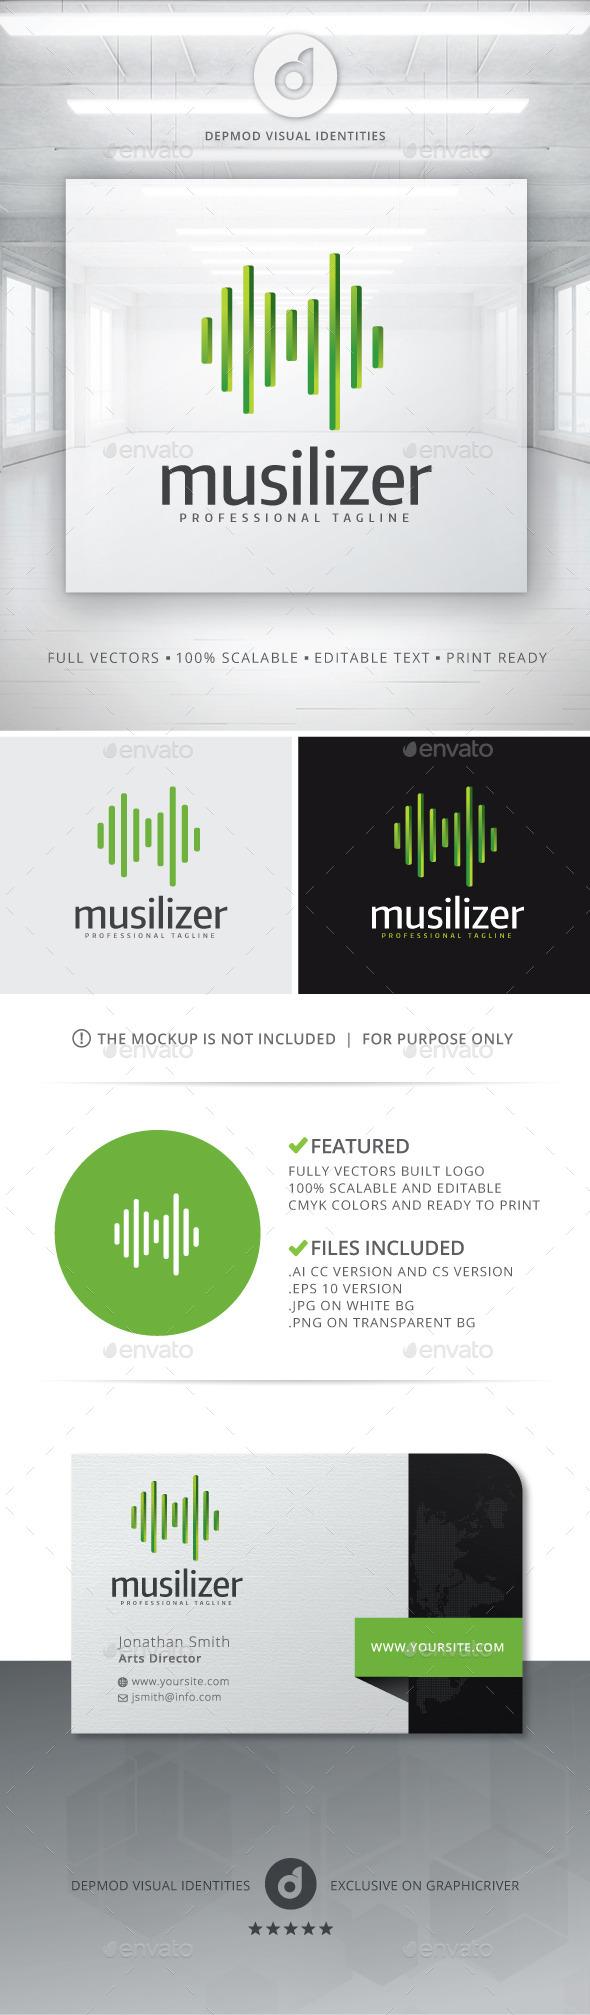 GraphicRiver Musilizer Logo 10966168